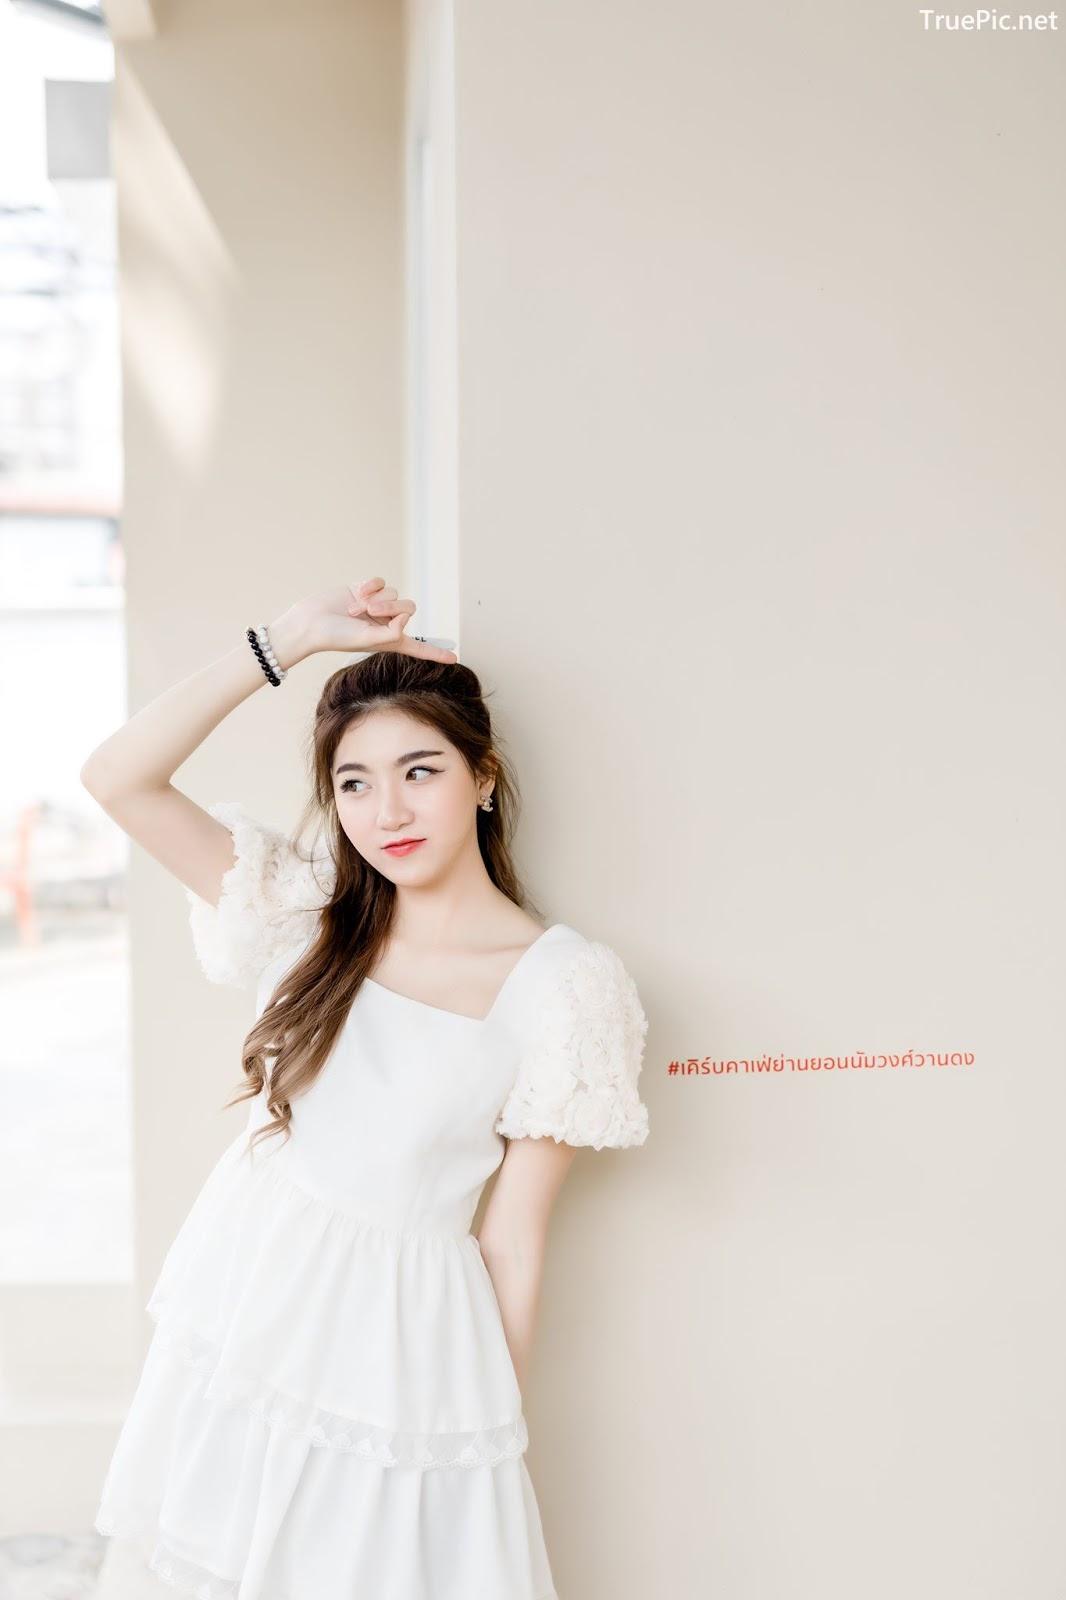 Image Thailand Model - Sasi Ngiunwan - Barbie Doll Smile - TruePic.net - Picture-14